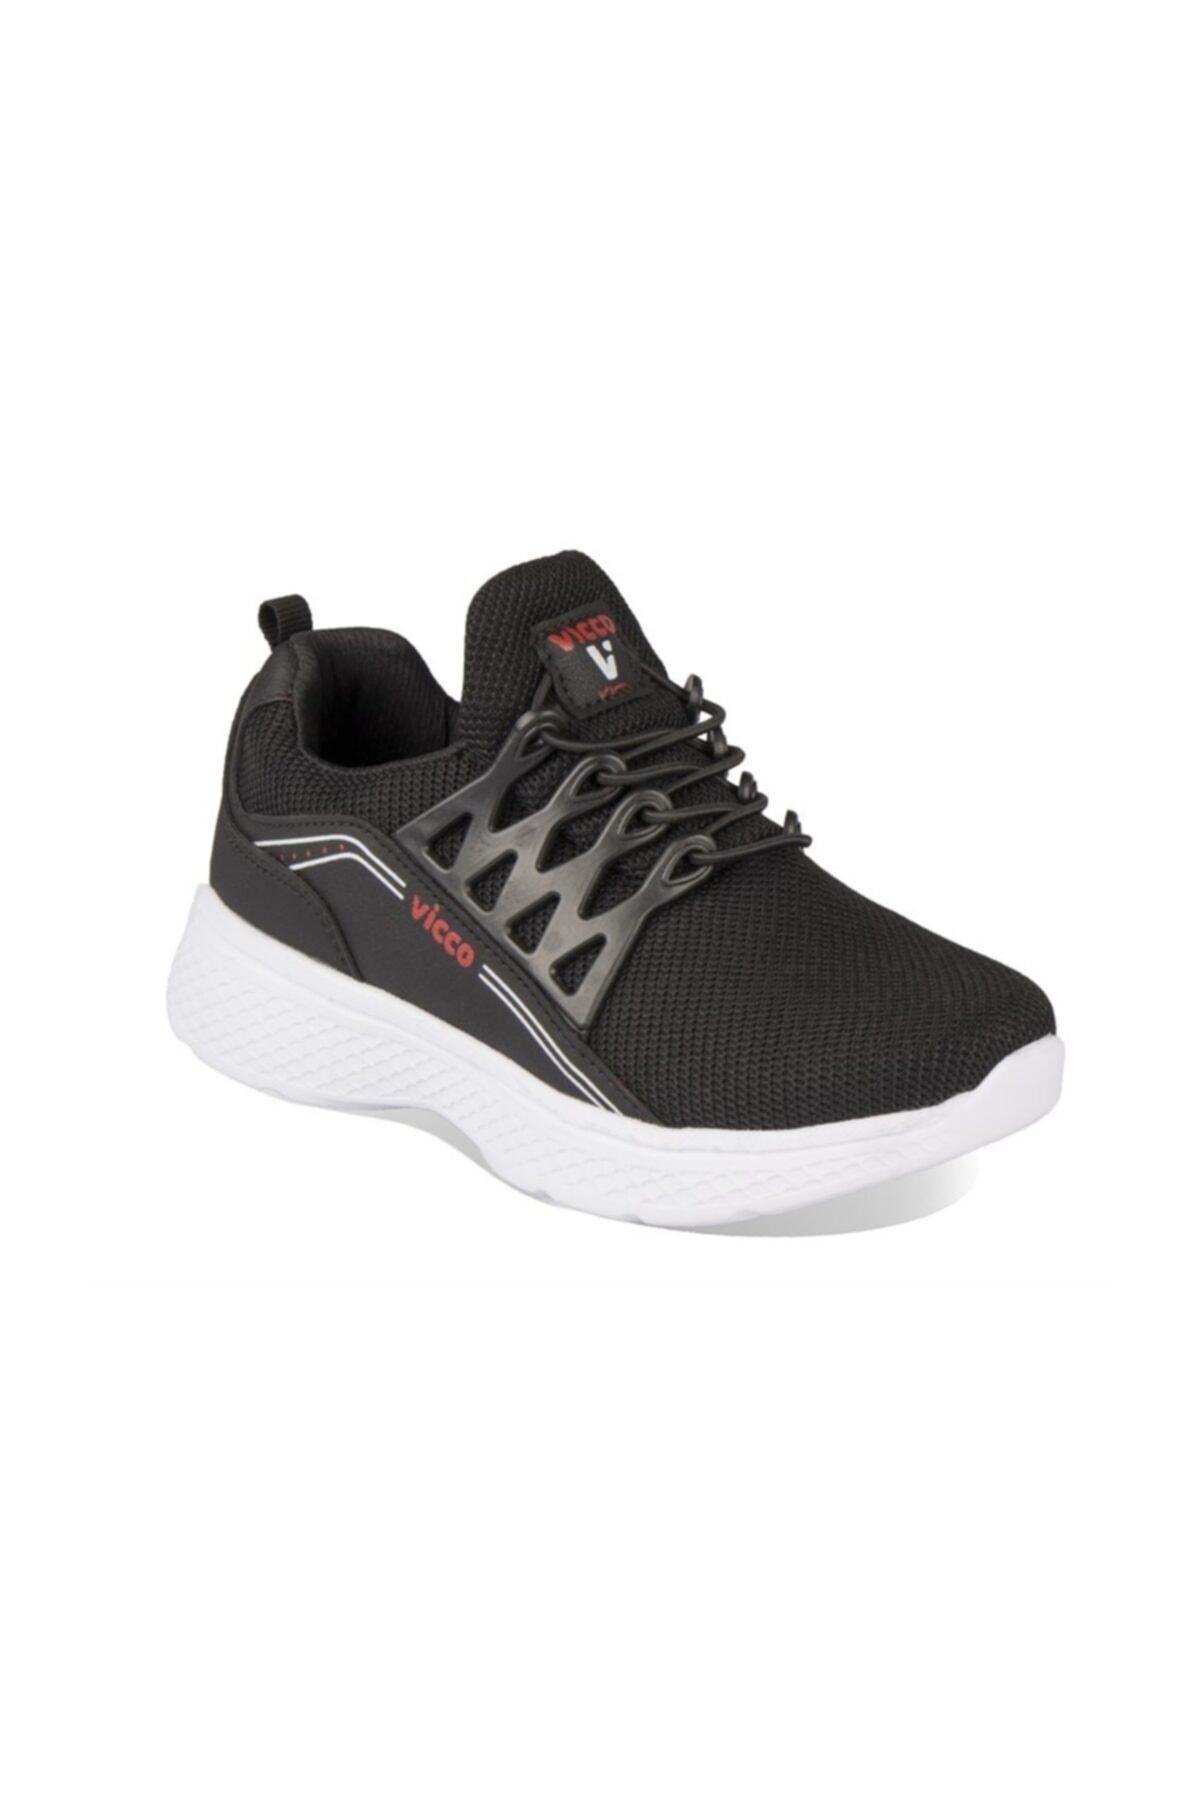 Vicco Spider Spor Ayakkabı Siyah 1